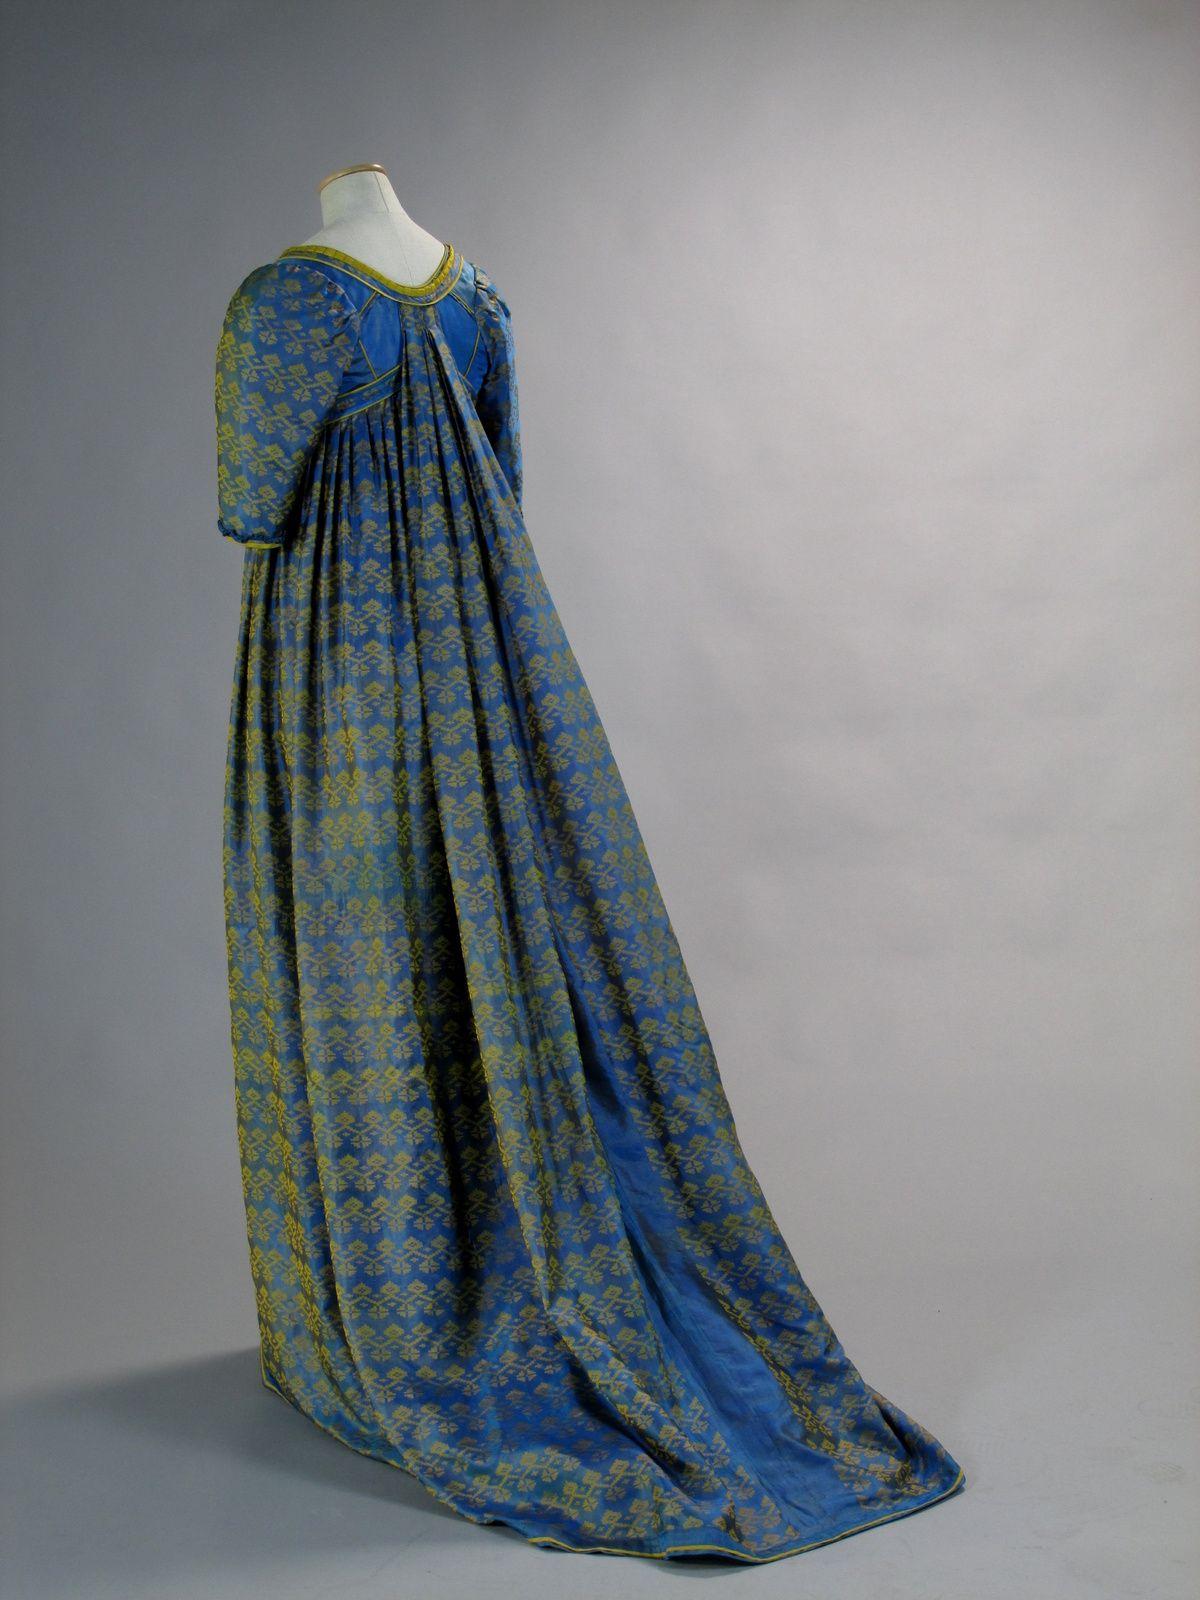 Costume designed by Maurizio Millenotti for Valeria Golino in Immortal Beloved (1994)